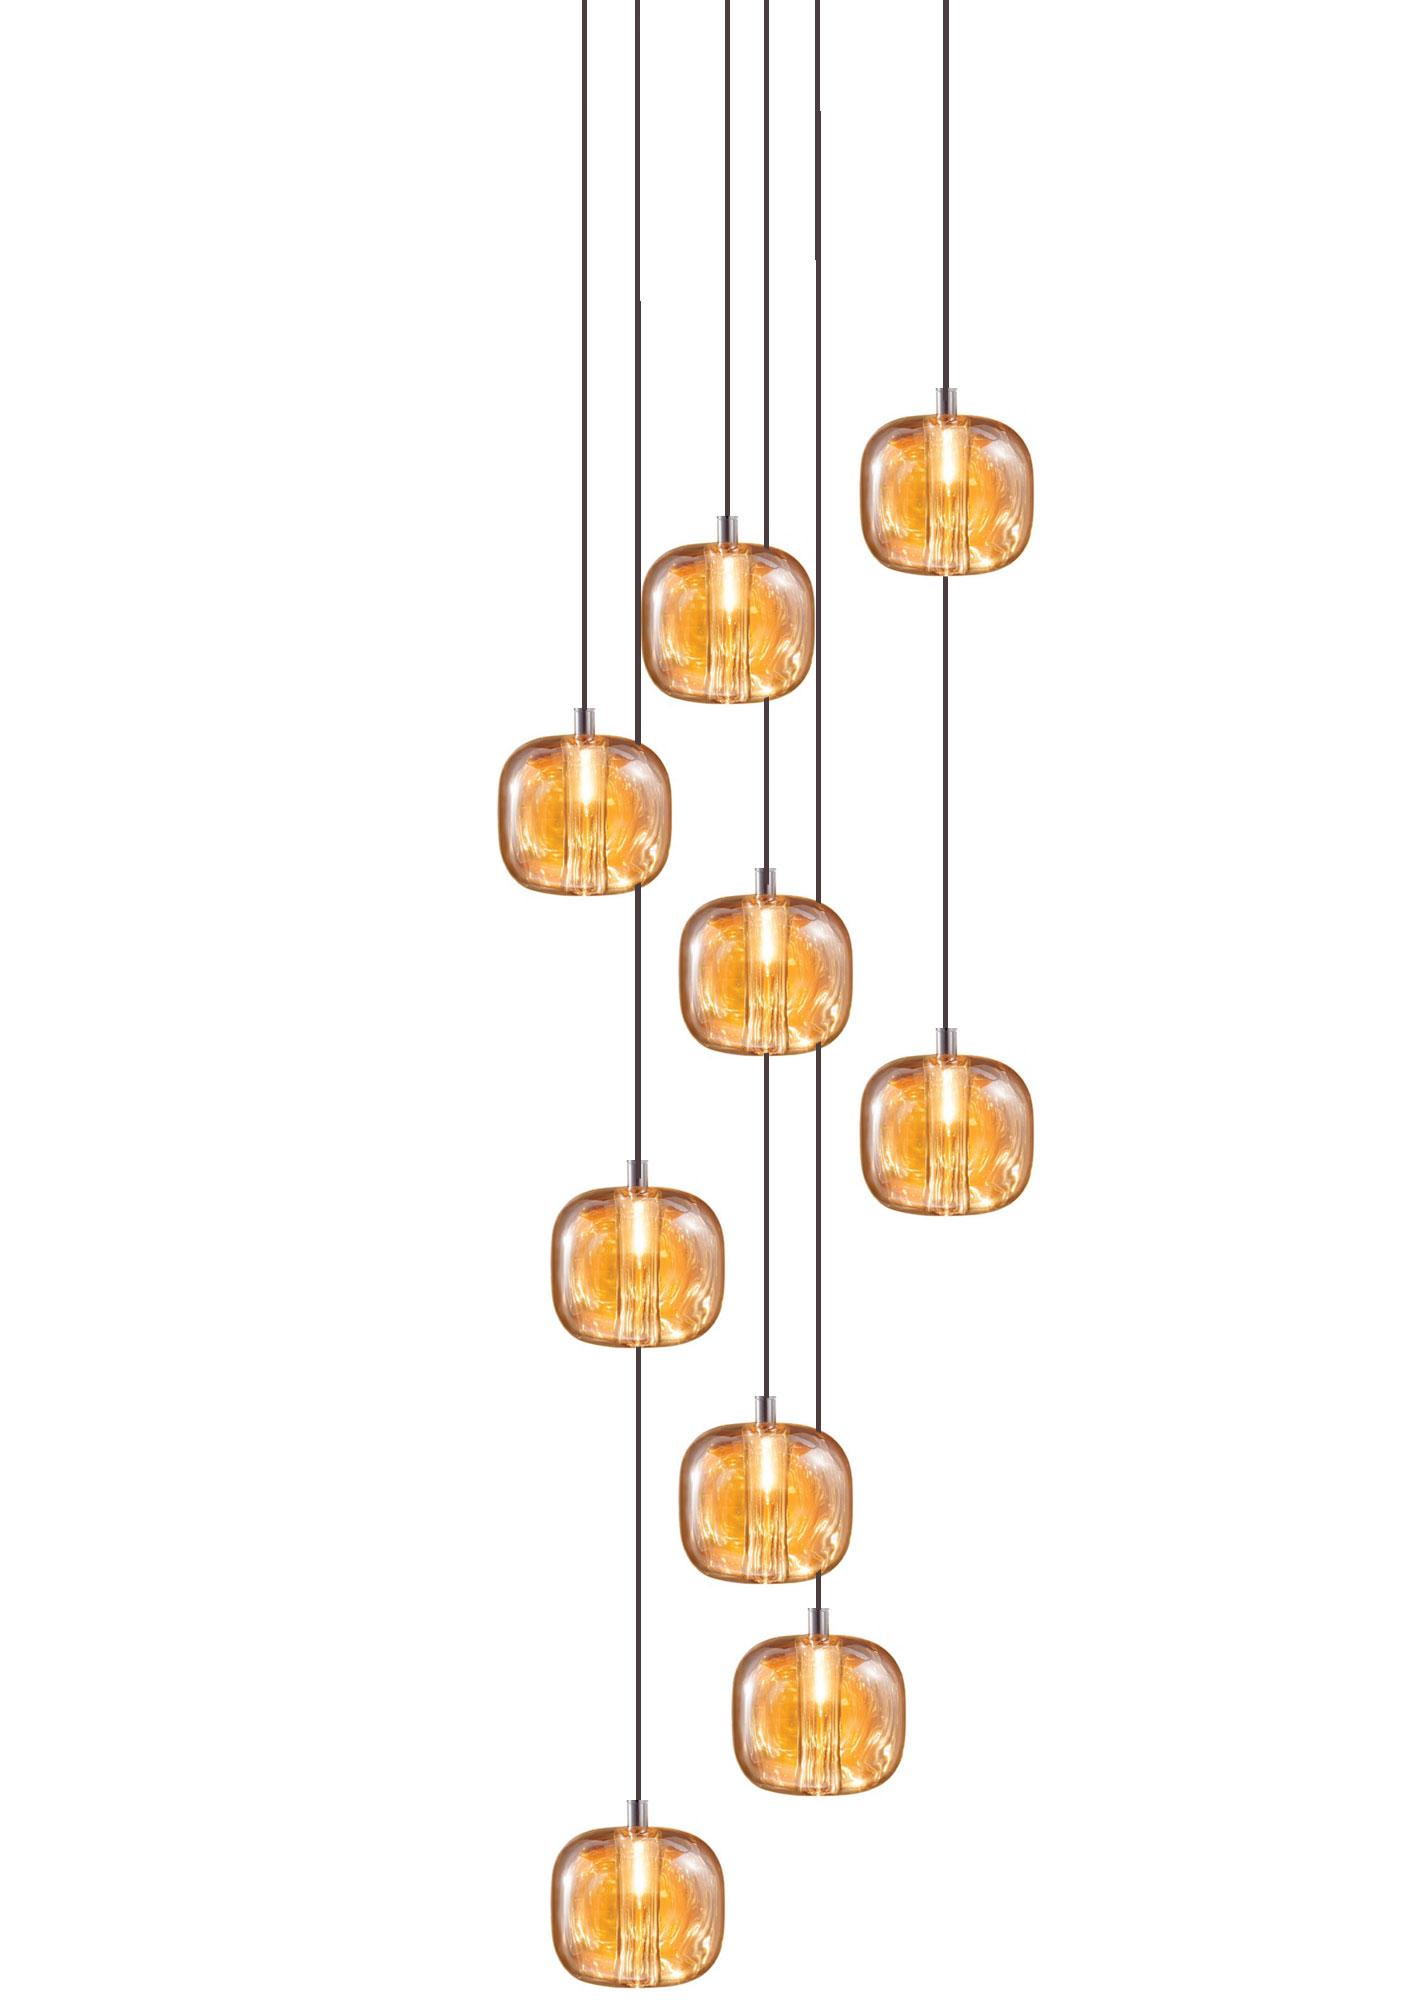 viso lighting. Cubie 9 Light Suspension By Viso Viso Lighting B